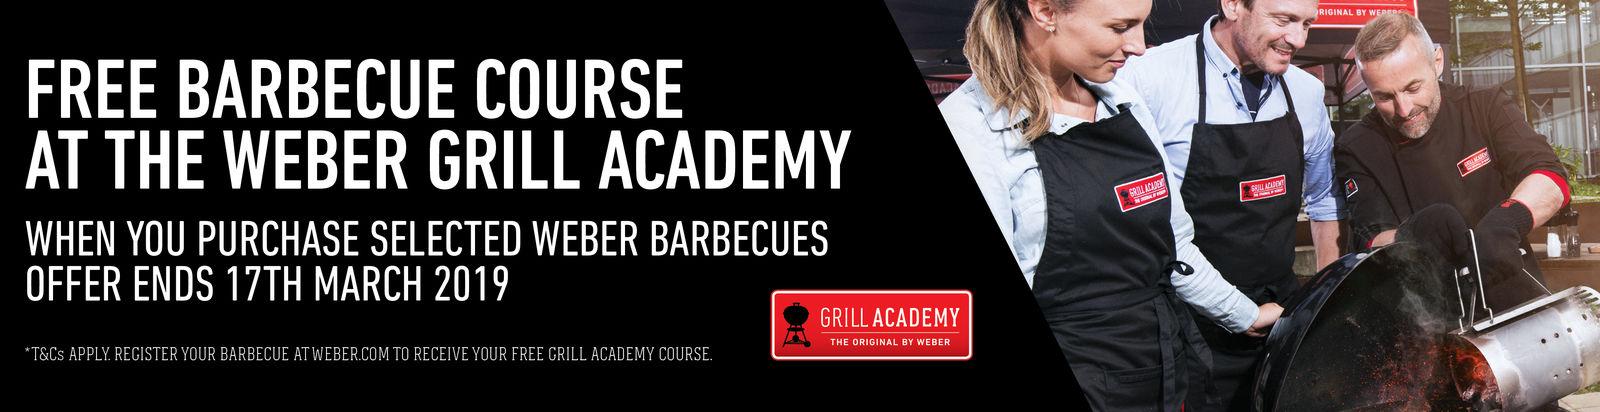 3538-grill-academy-online-retailer-banner-hi-res-970x250px-1600x1600.jpg